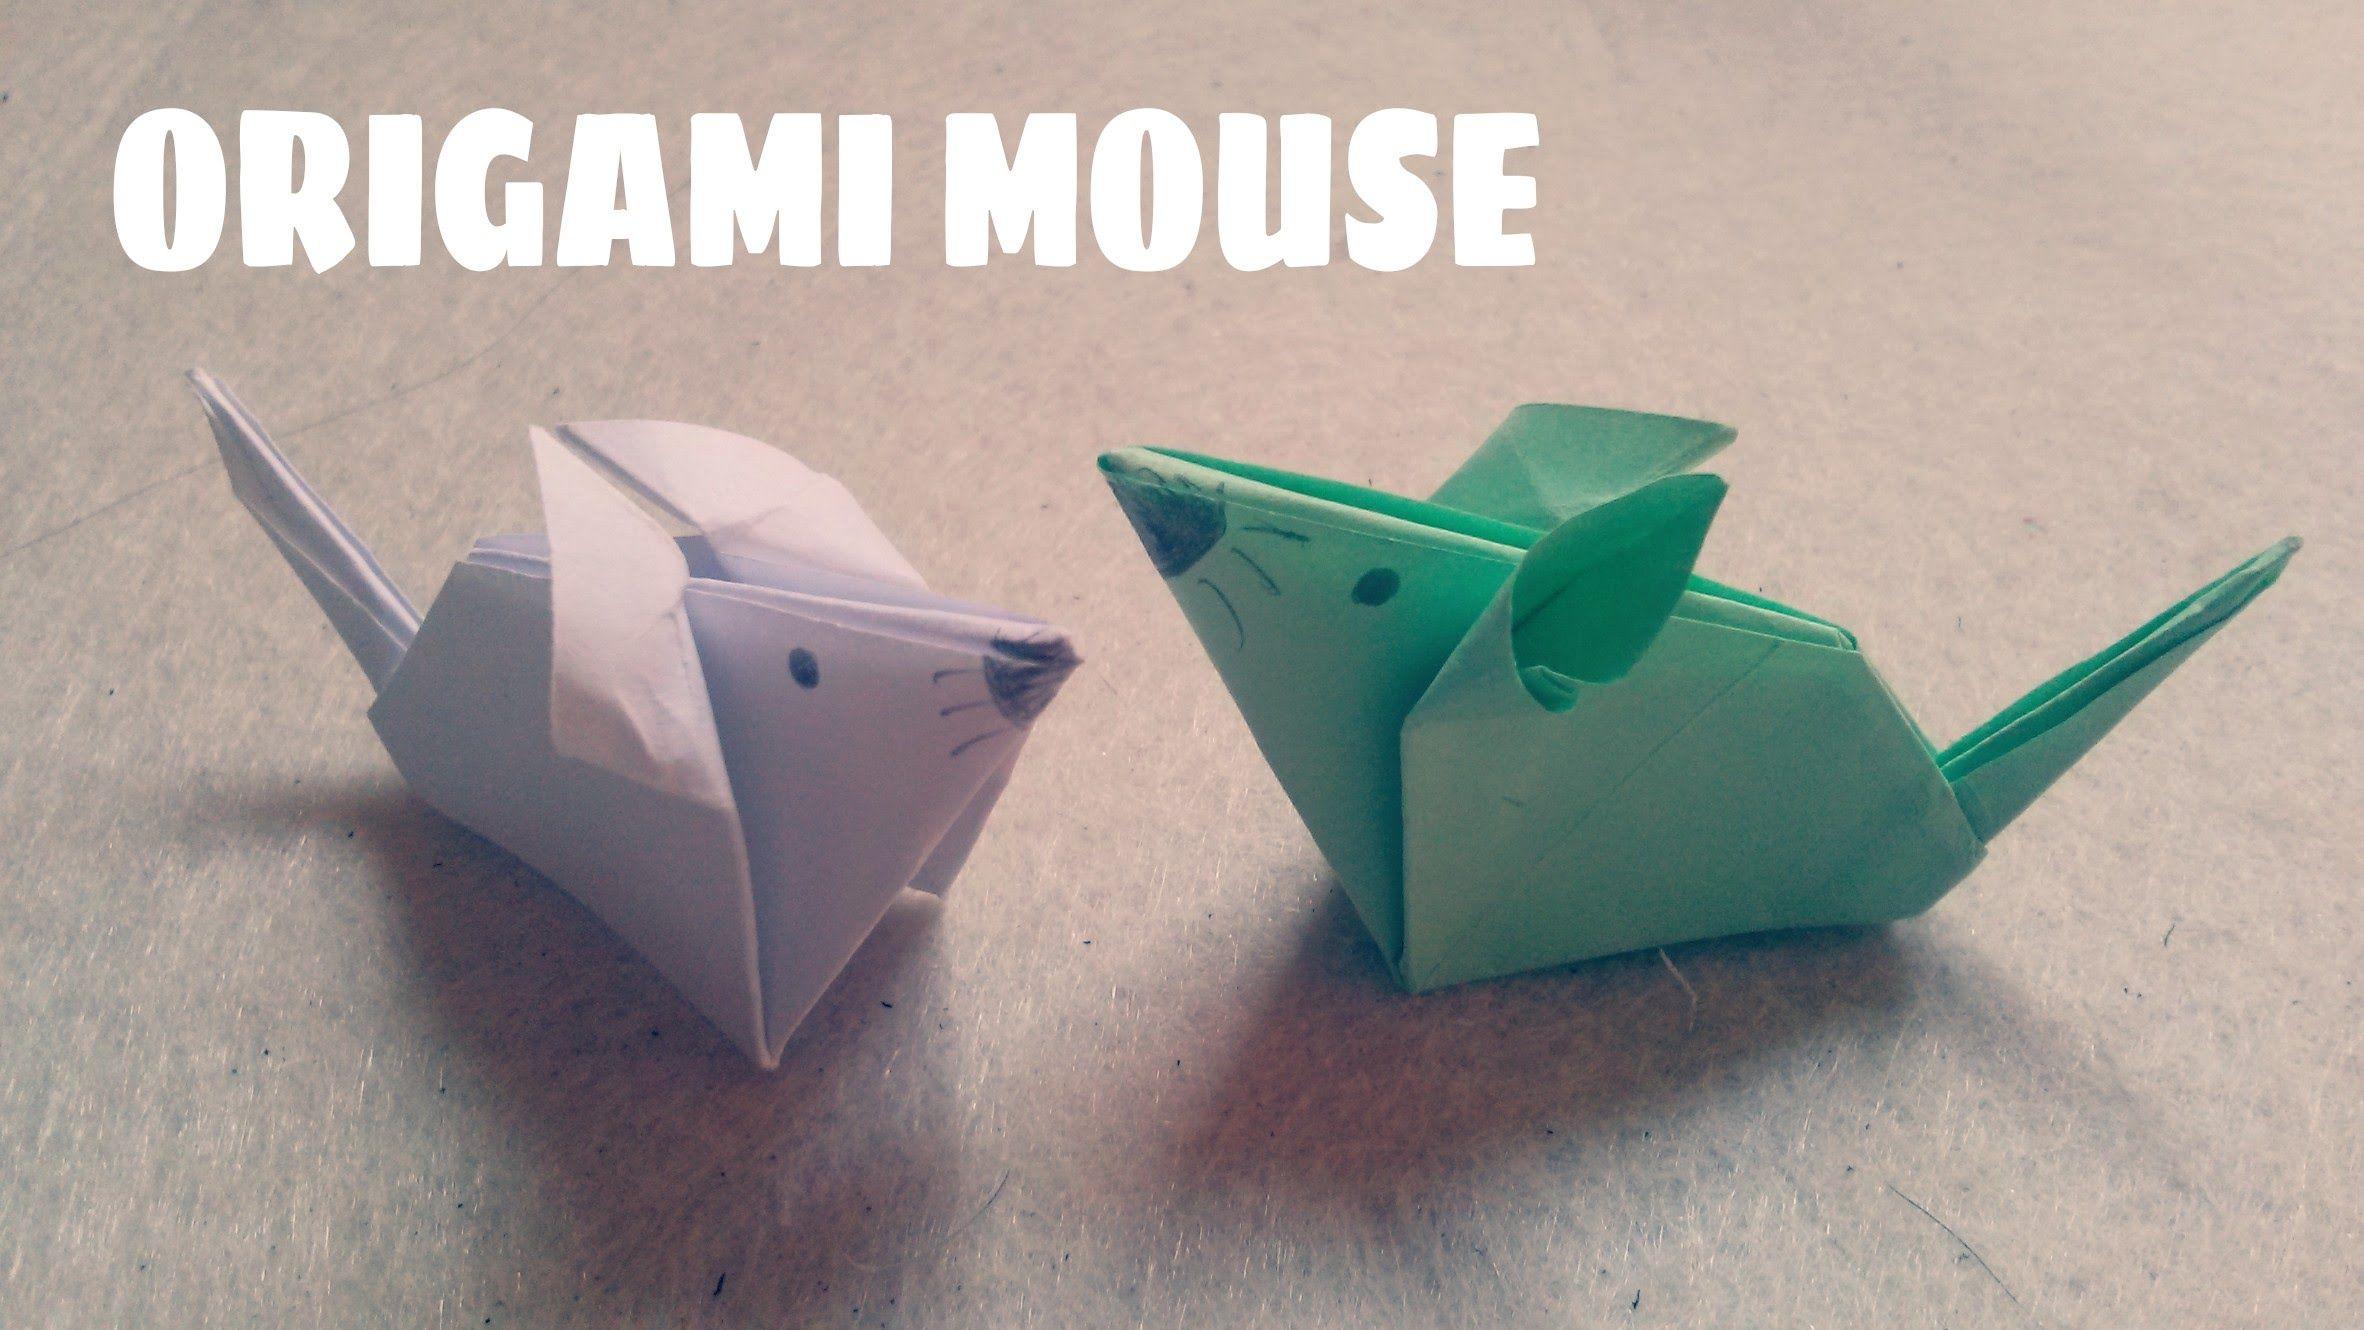 Origami Facile - Souris | Origami-Tiere, Origami Für Kinder tout Origami Facile A Faire En Français